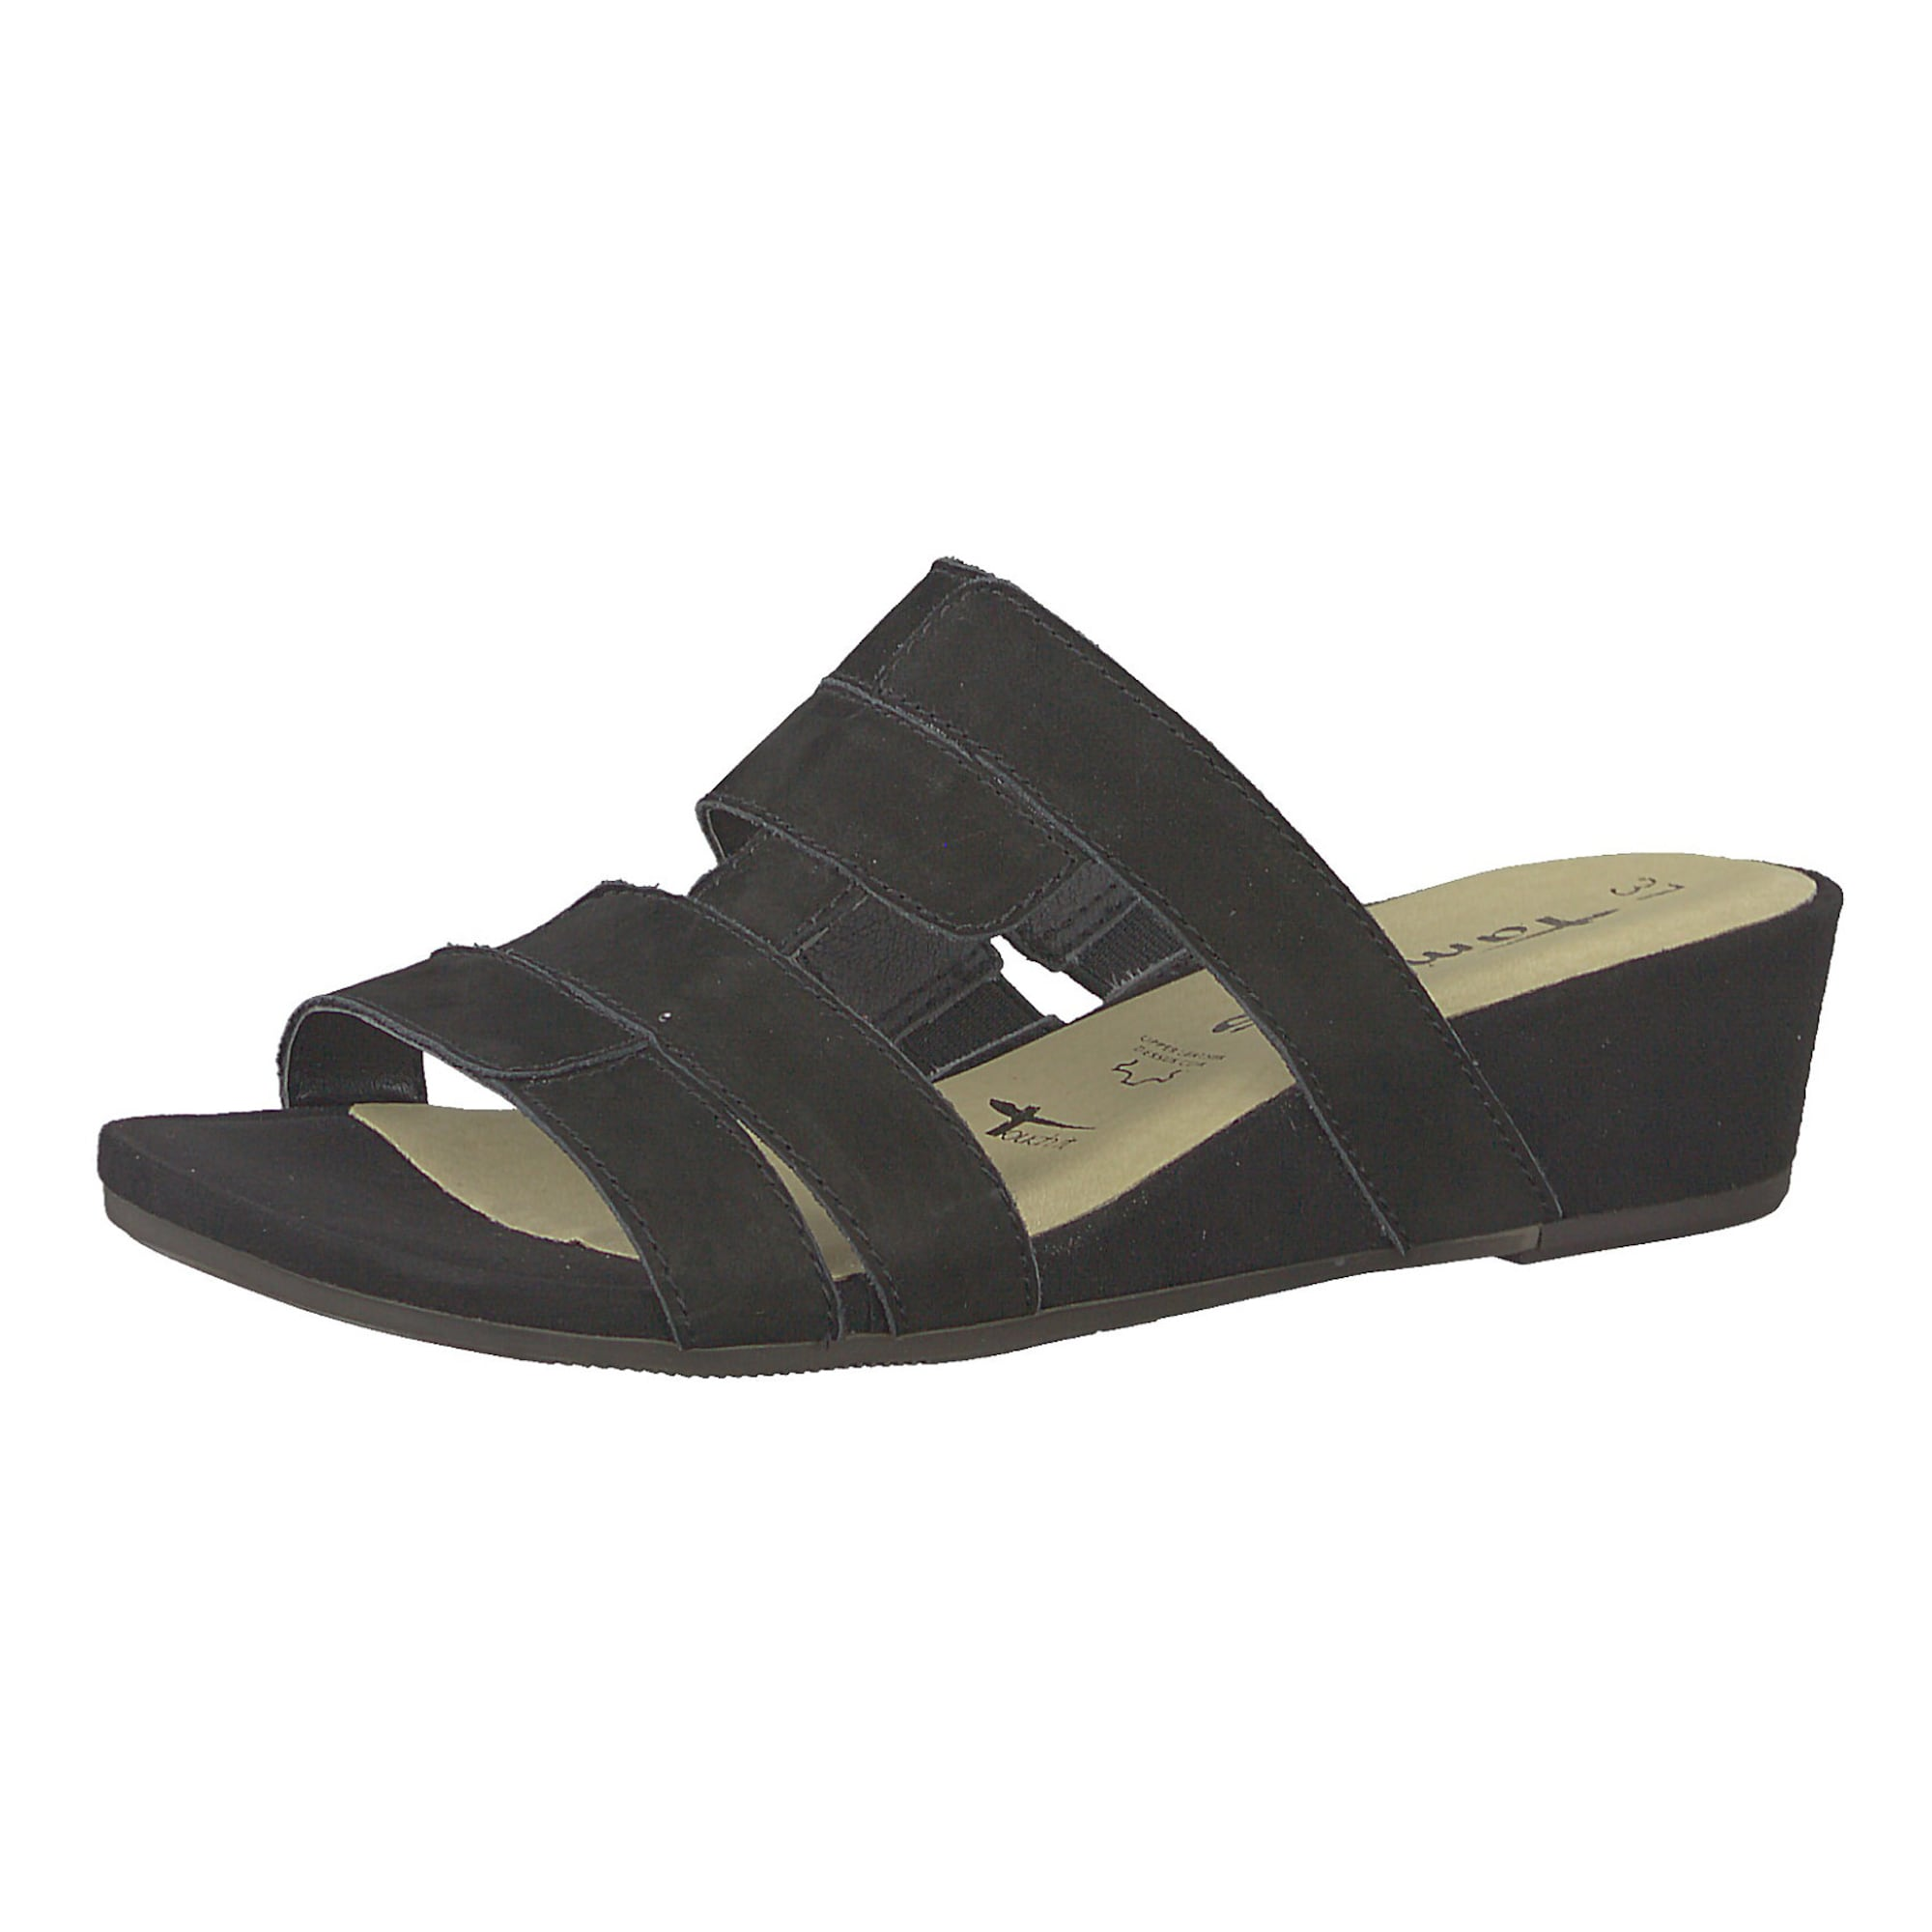 Pantoletten | Schuhe > Clogs & Pantoletten | Schwarz | tamaris